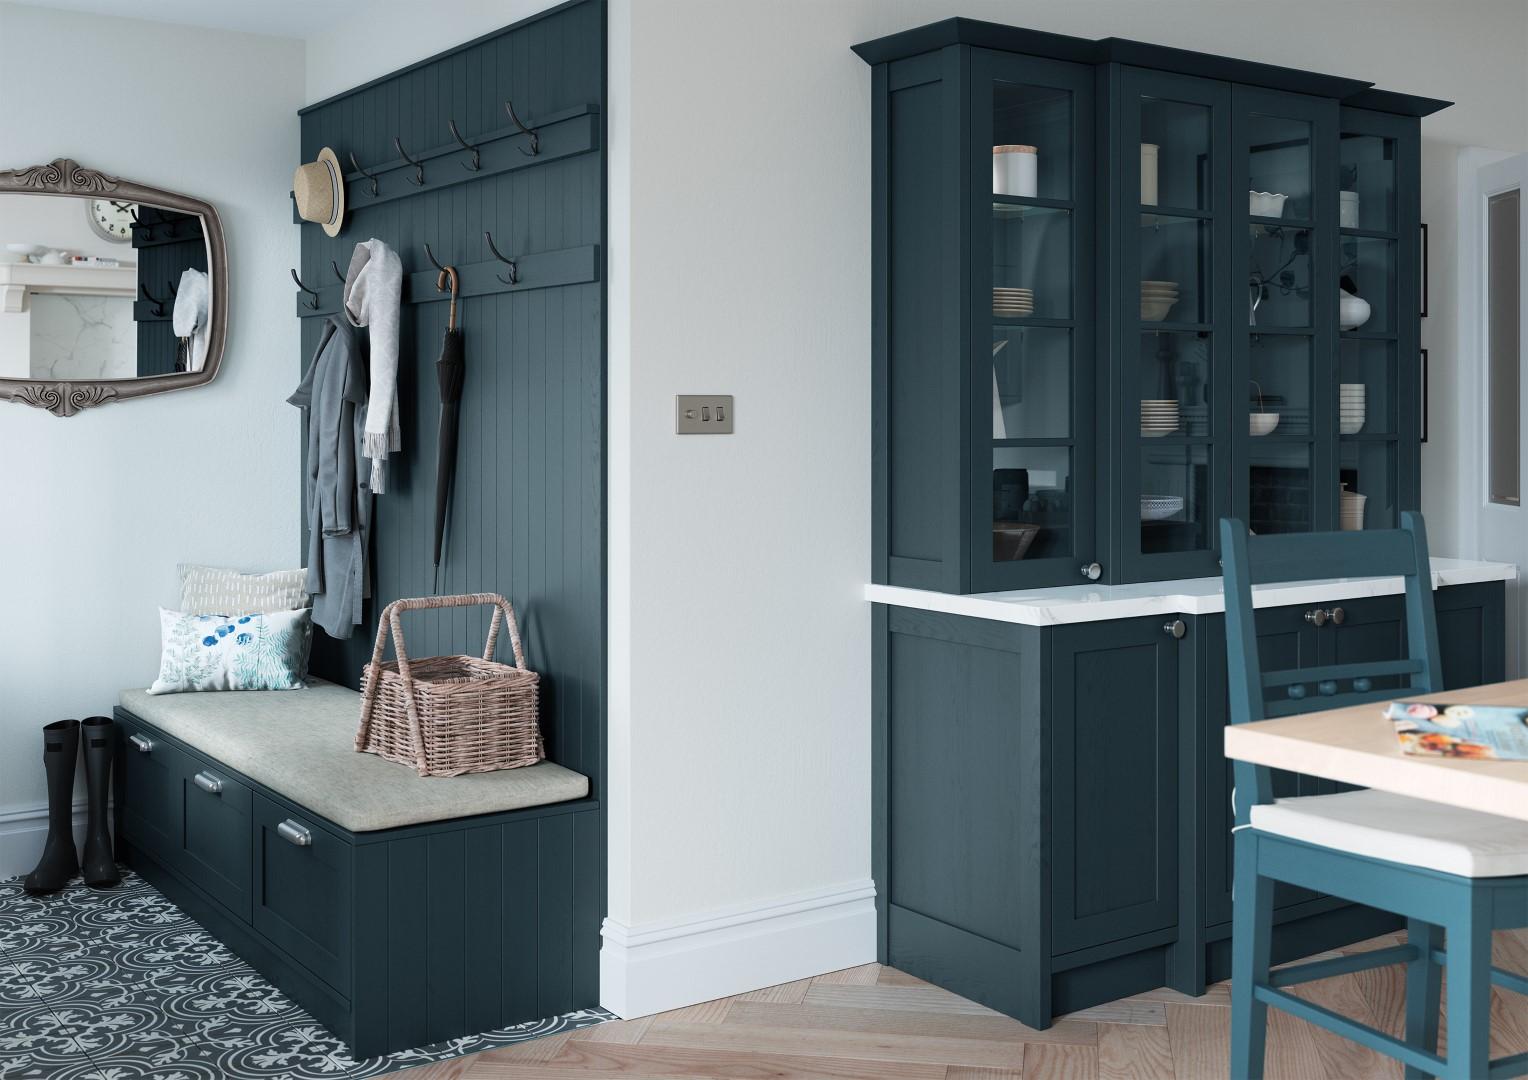 Aldana Stone and Marine - Kitchen Design - Alan Kelly Kitchens - Waterford - 5